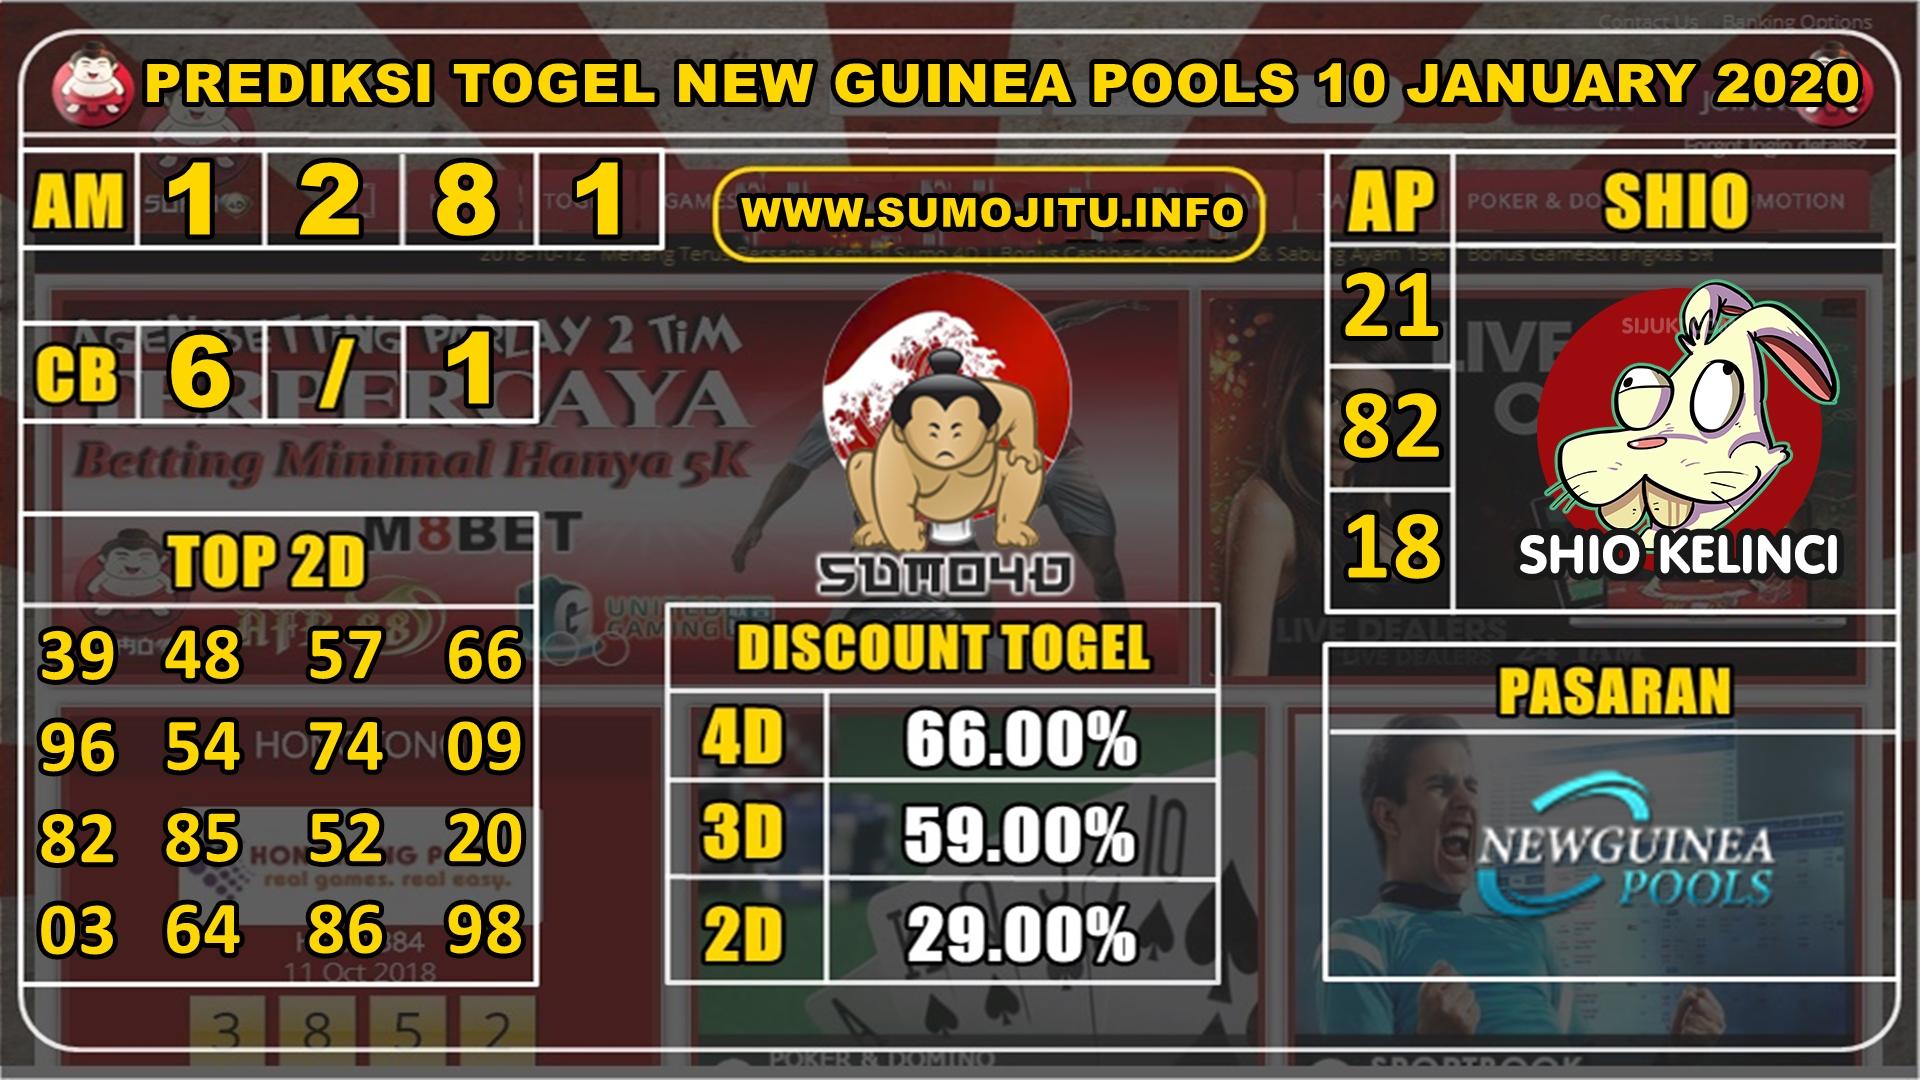 PREDIKSI TOGEL NEW GUINEA POOLS 10 JANUARY 2020